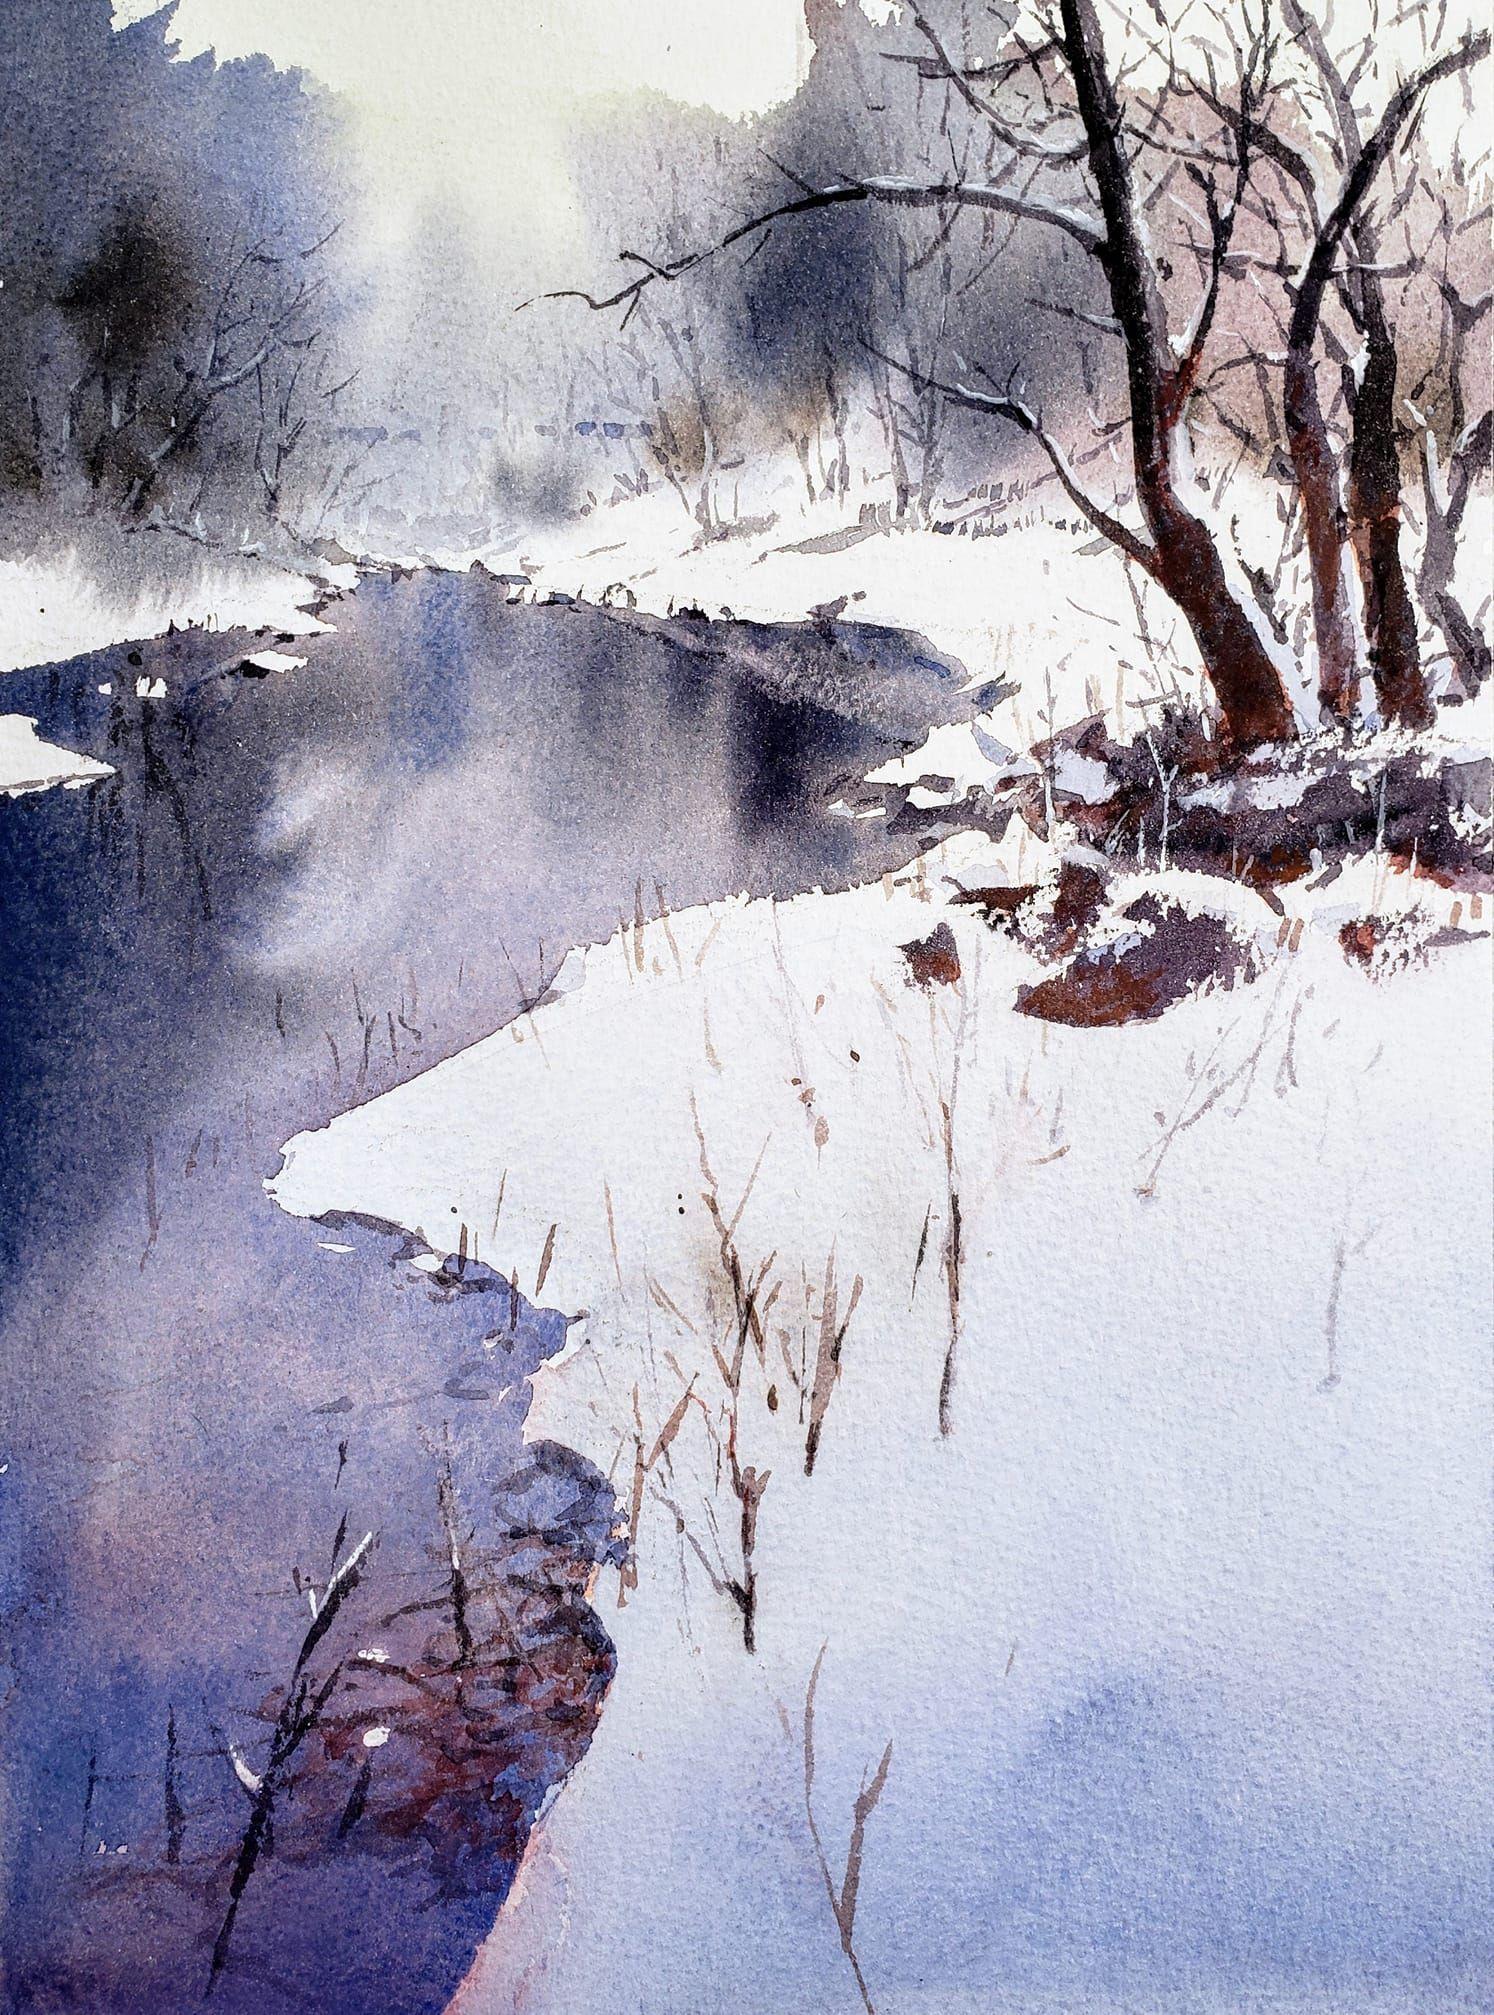 Yong Hong Zhong March 2019 Winter Watercolor Winter Landscape